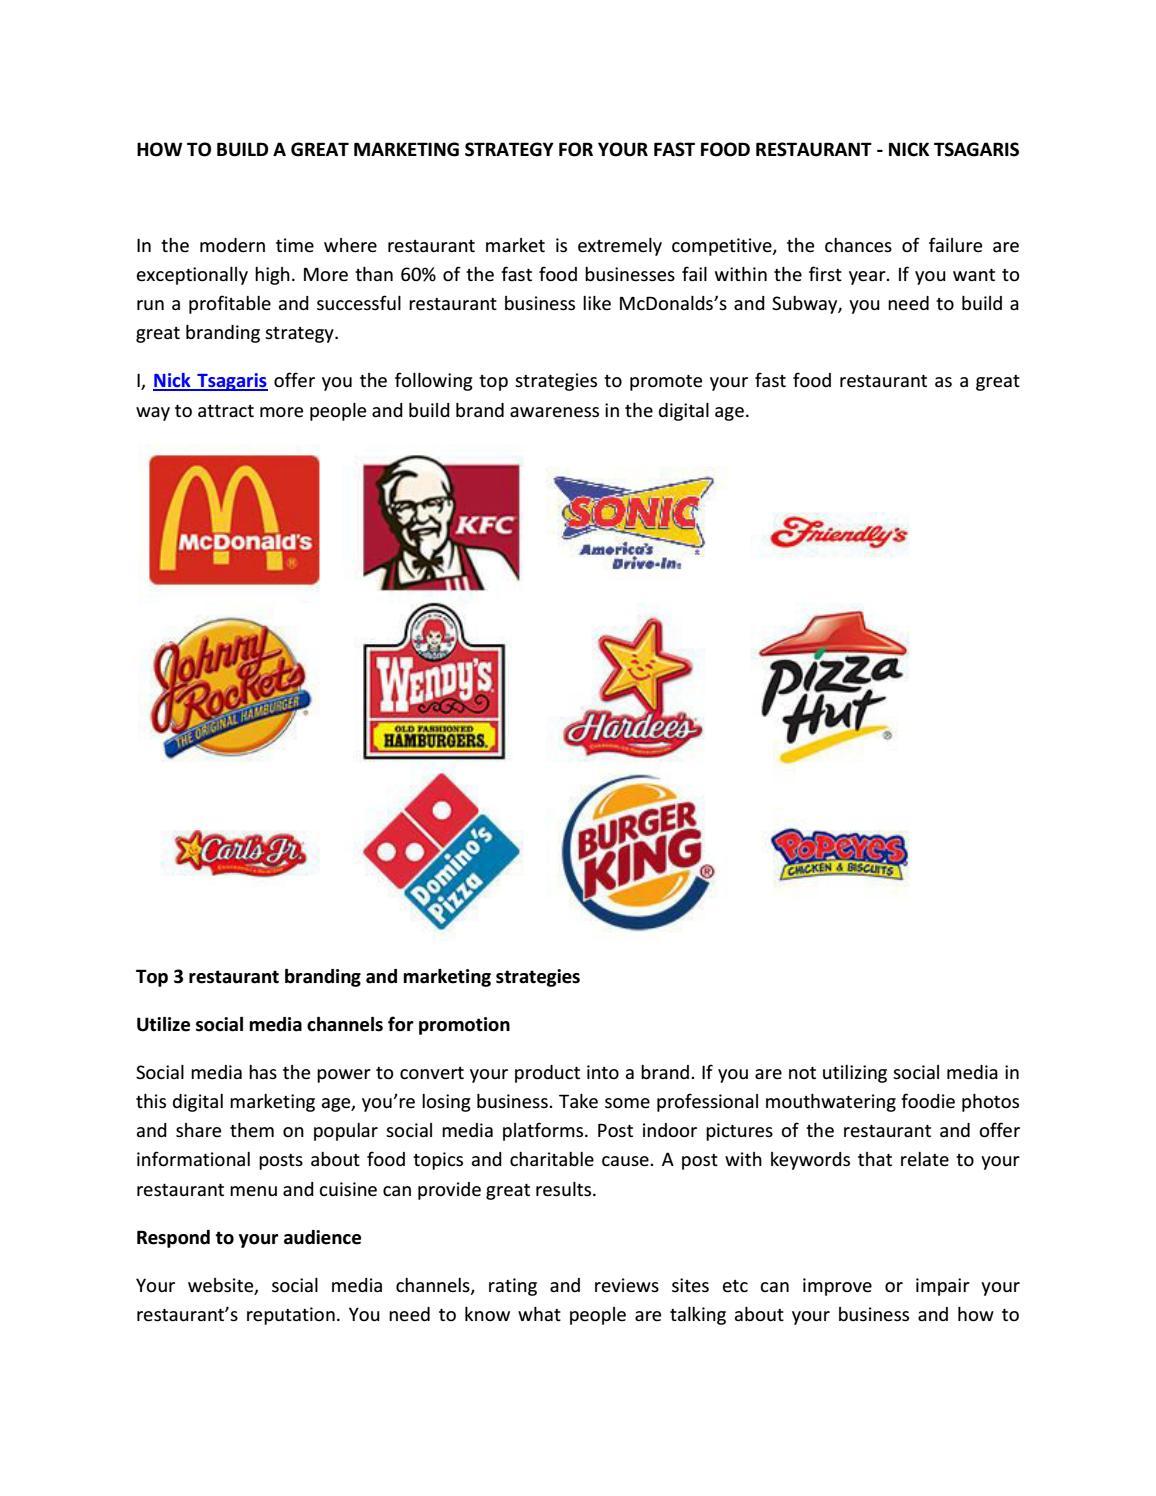 subway restaurant marketing strategy